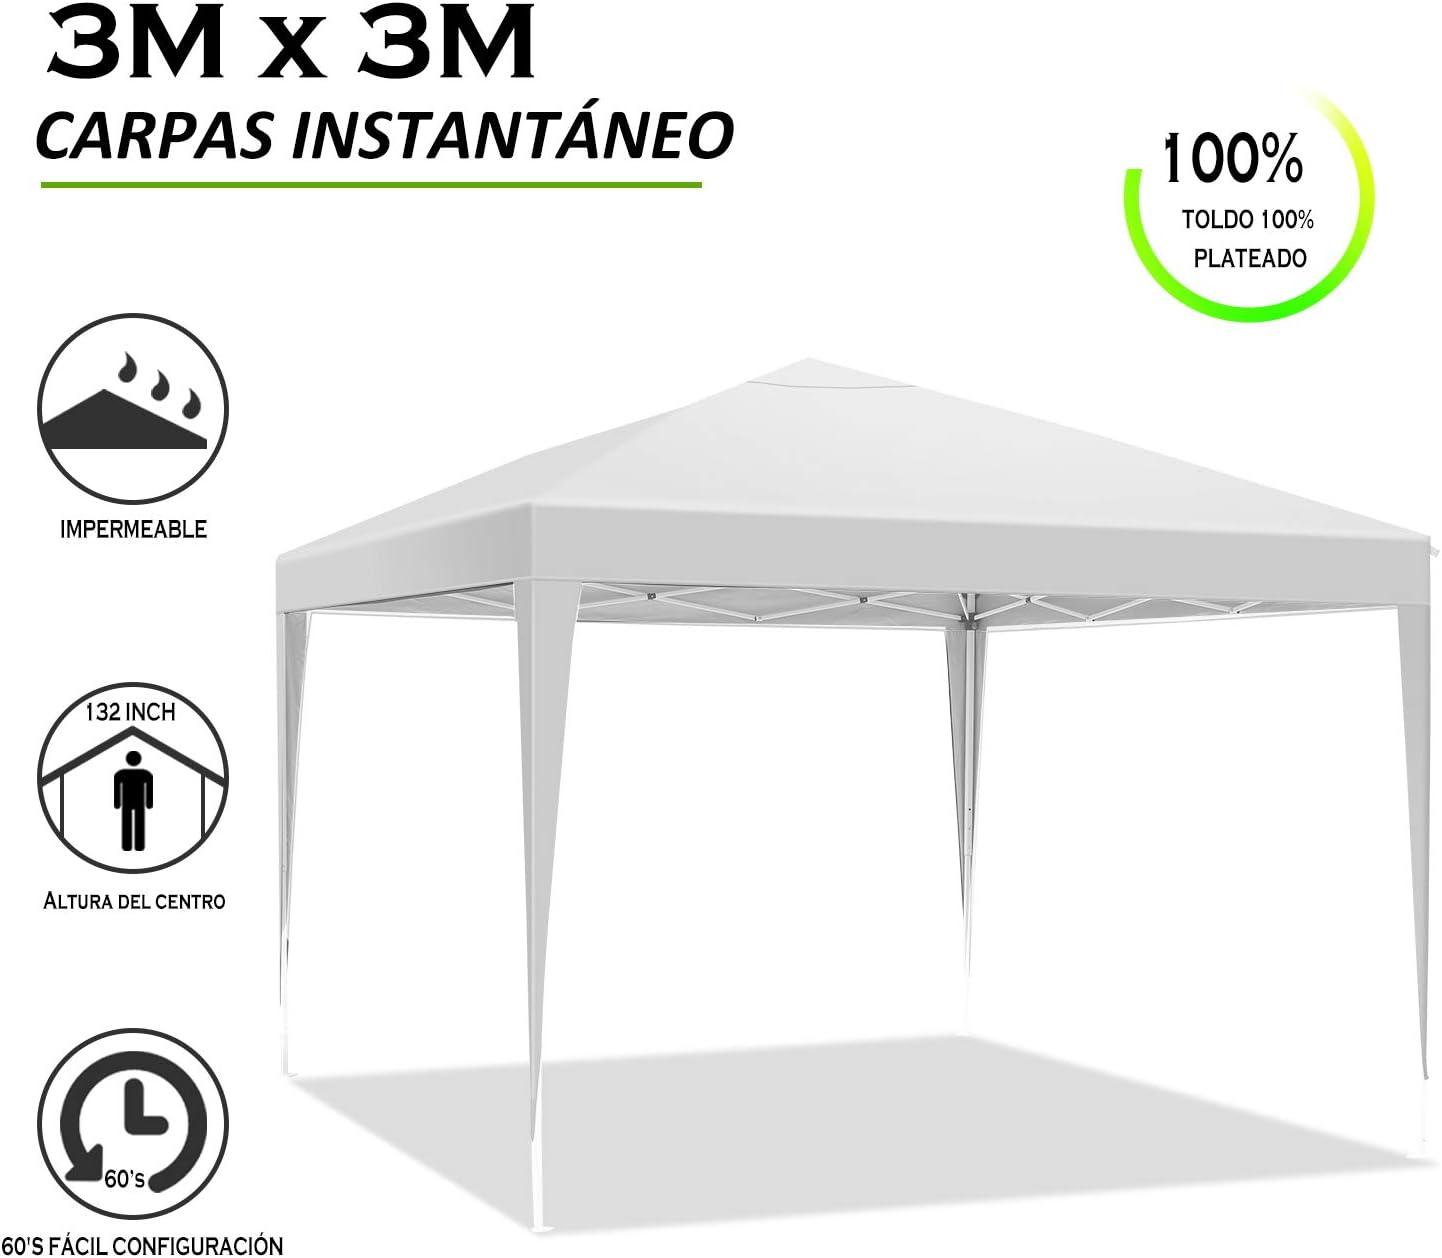 YUEBO Carpa 3x3 m Carpas Plegables Impermeables Gazebo Plegable Cenador Plegable Camping Cenadores para Jardin ...